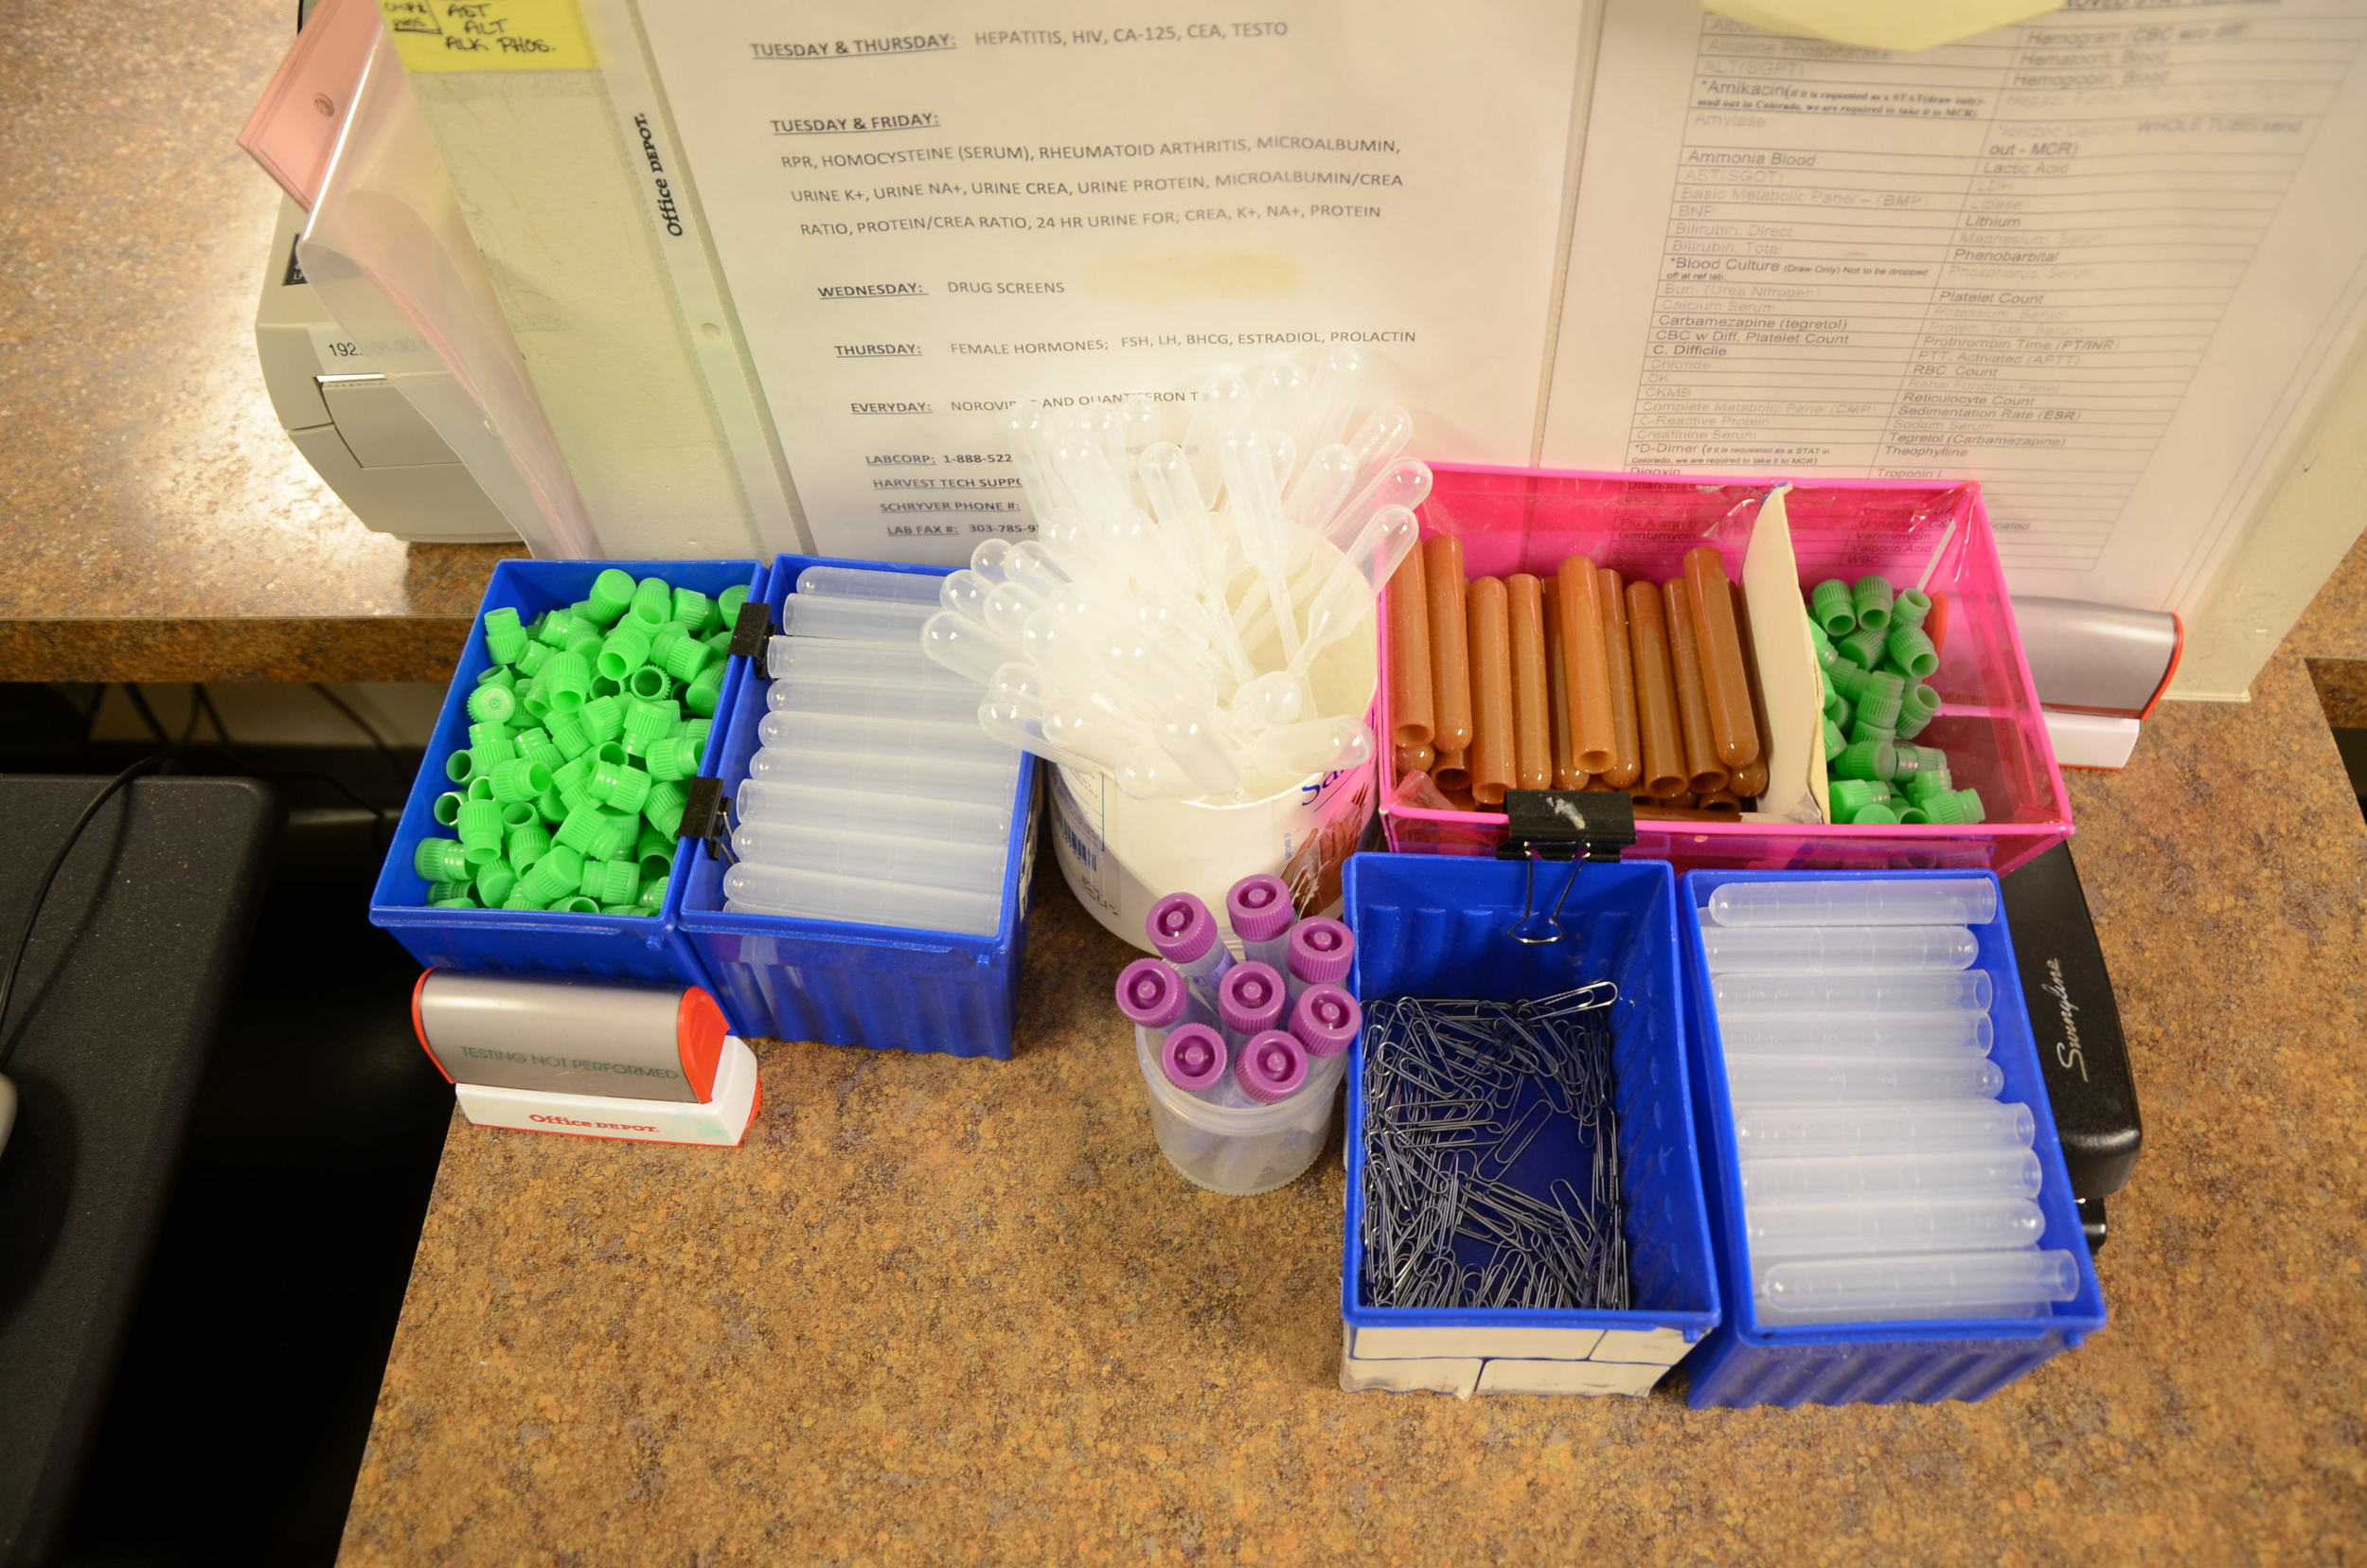 Specimen Processing Supplies